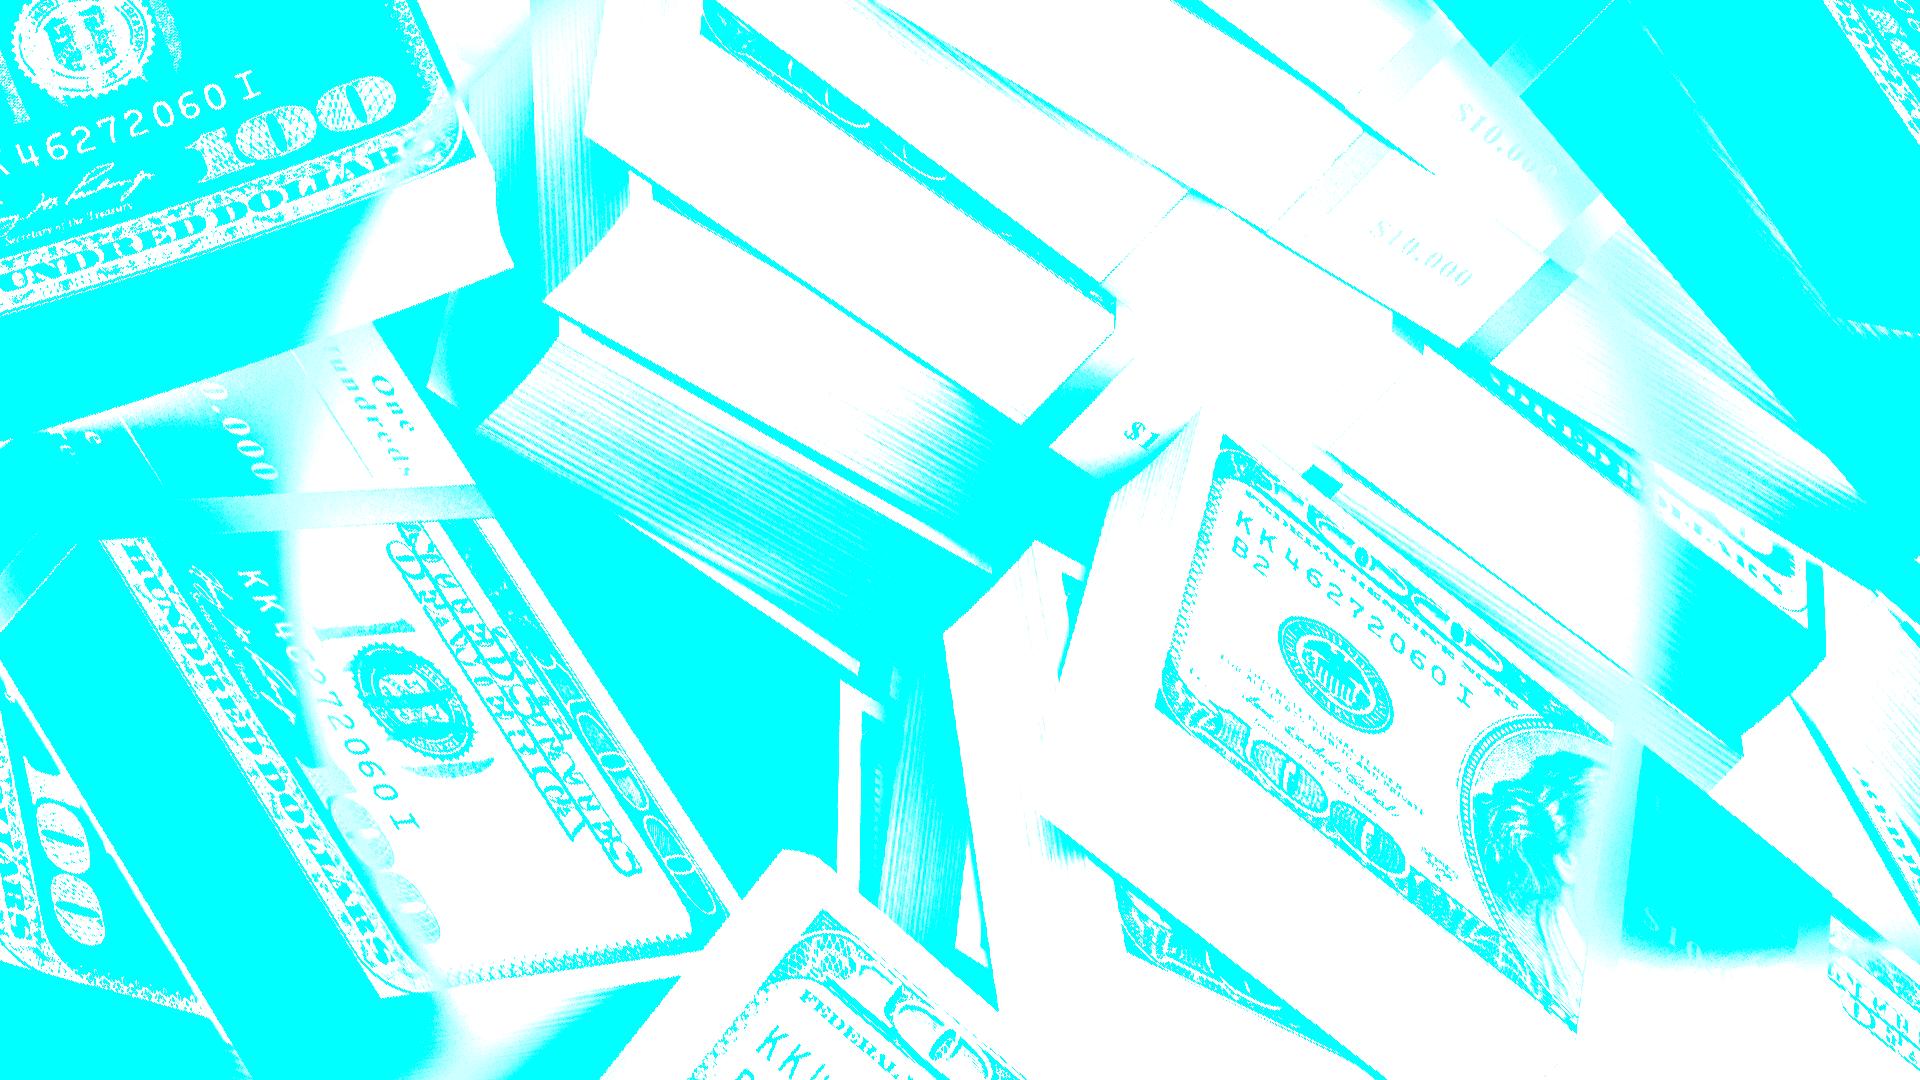 Crypto services startup Ripio raises $50 million in Series B funding round